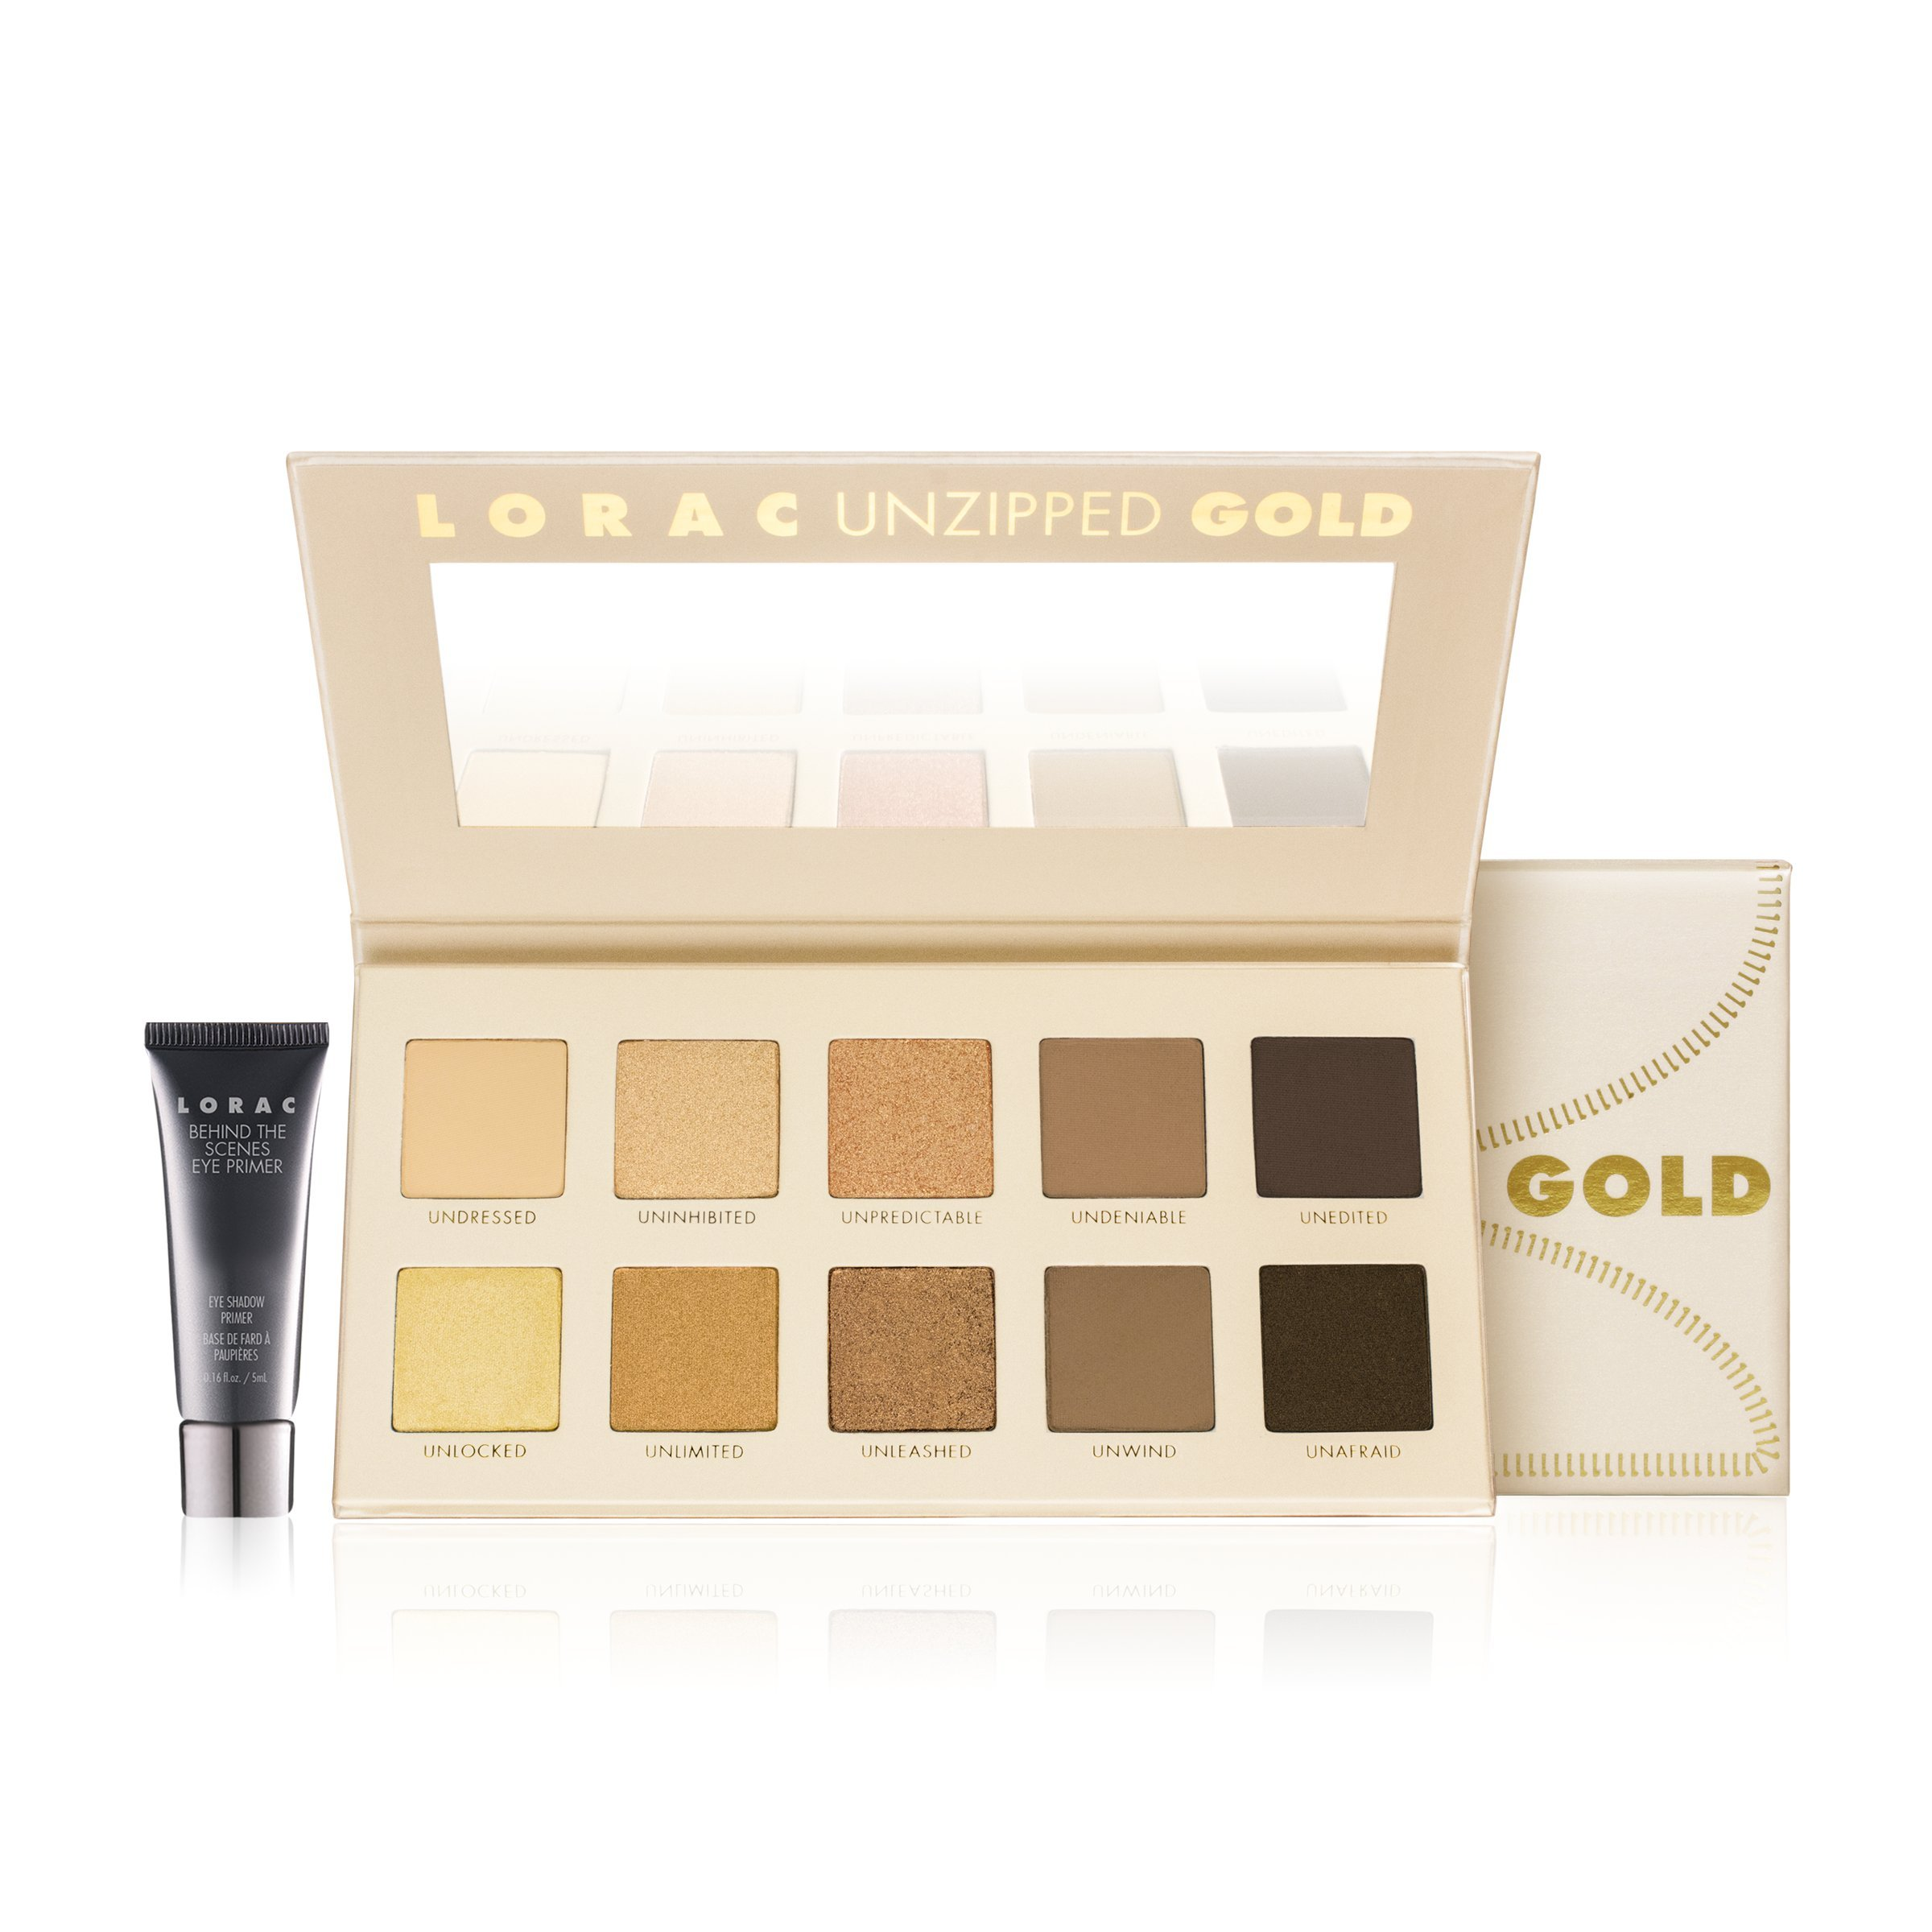 LORAC Unzipped Gold Shimmer and Matte Eye Shadow Palette